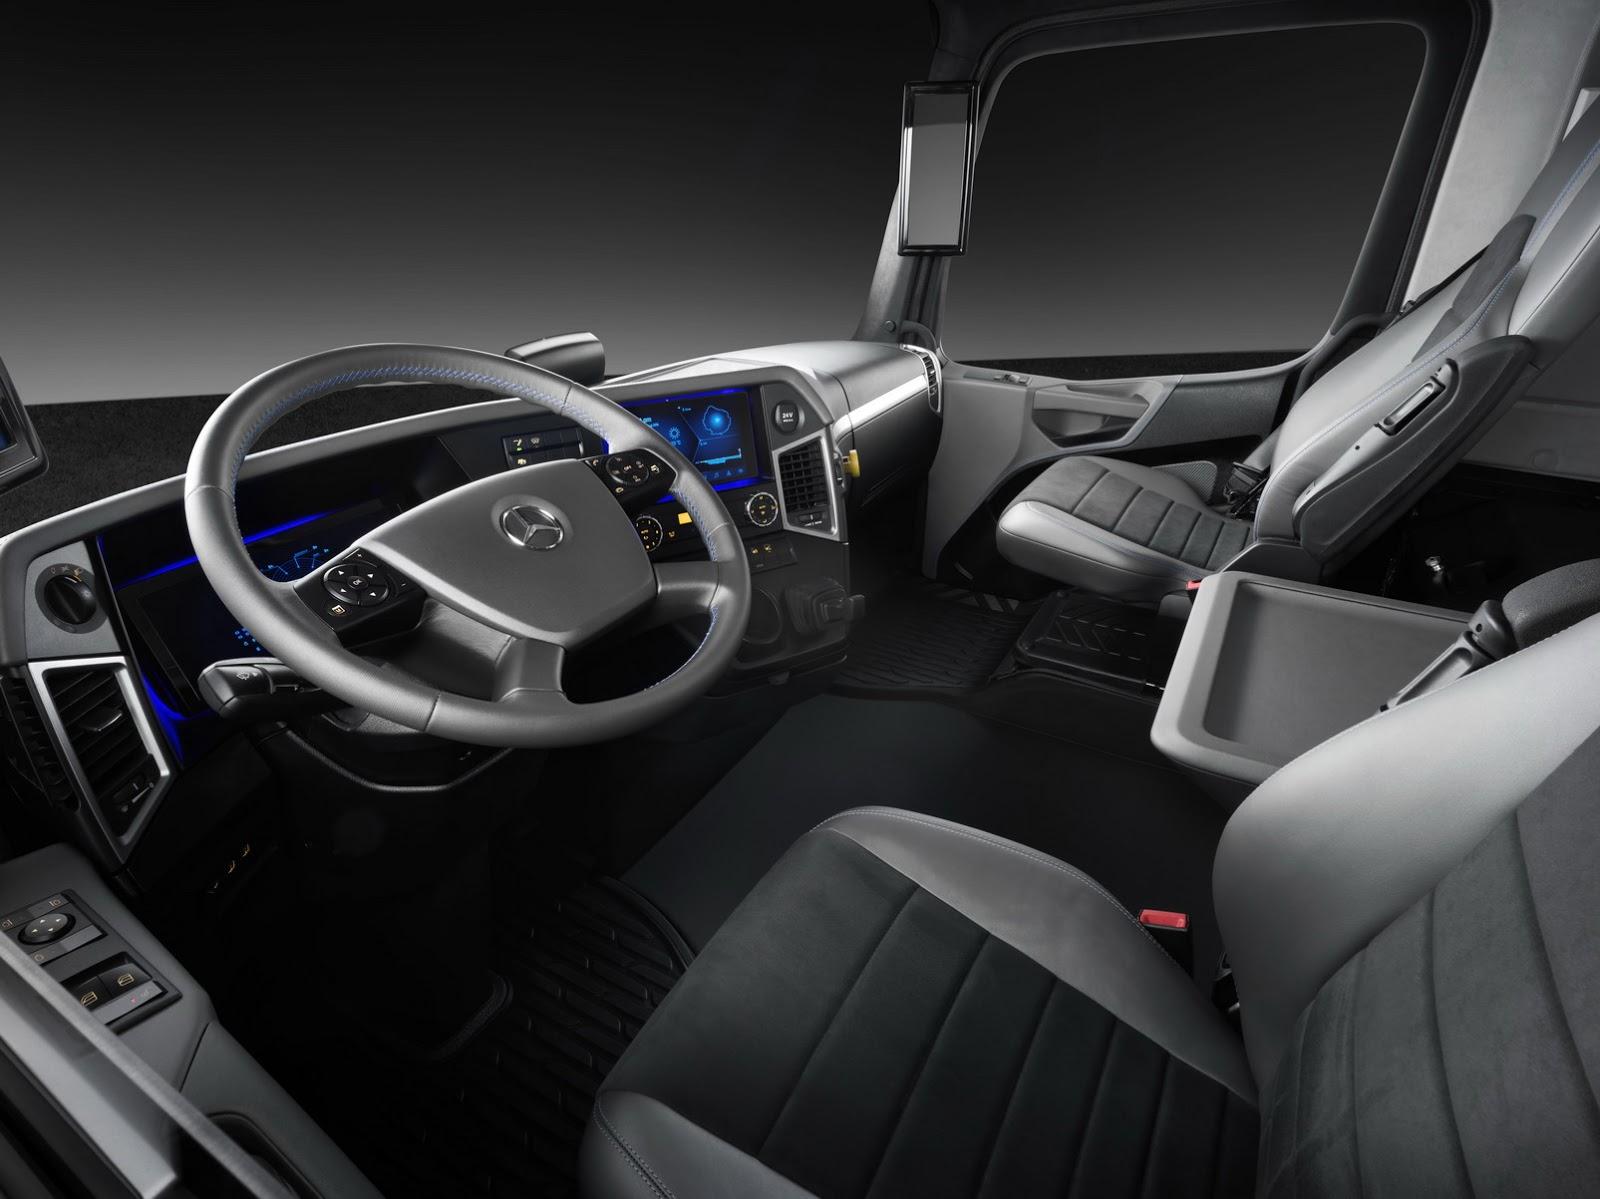 2016 Mercedes Benz Urban Etruck Concepts Interior Concept